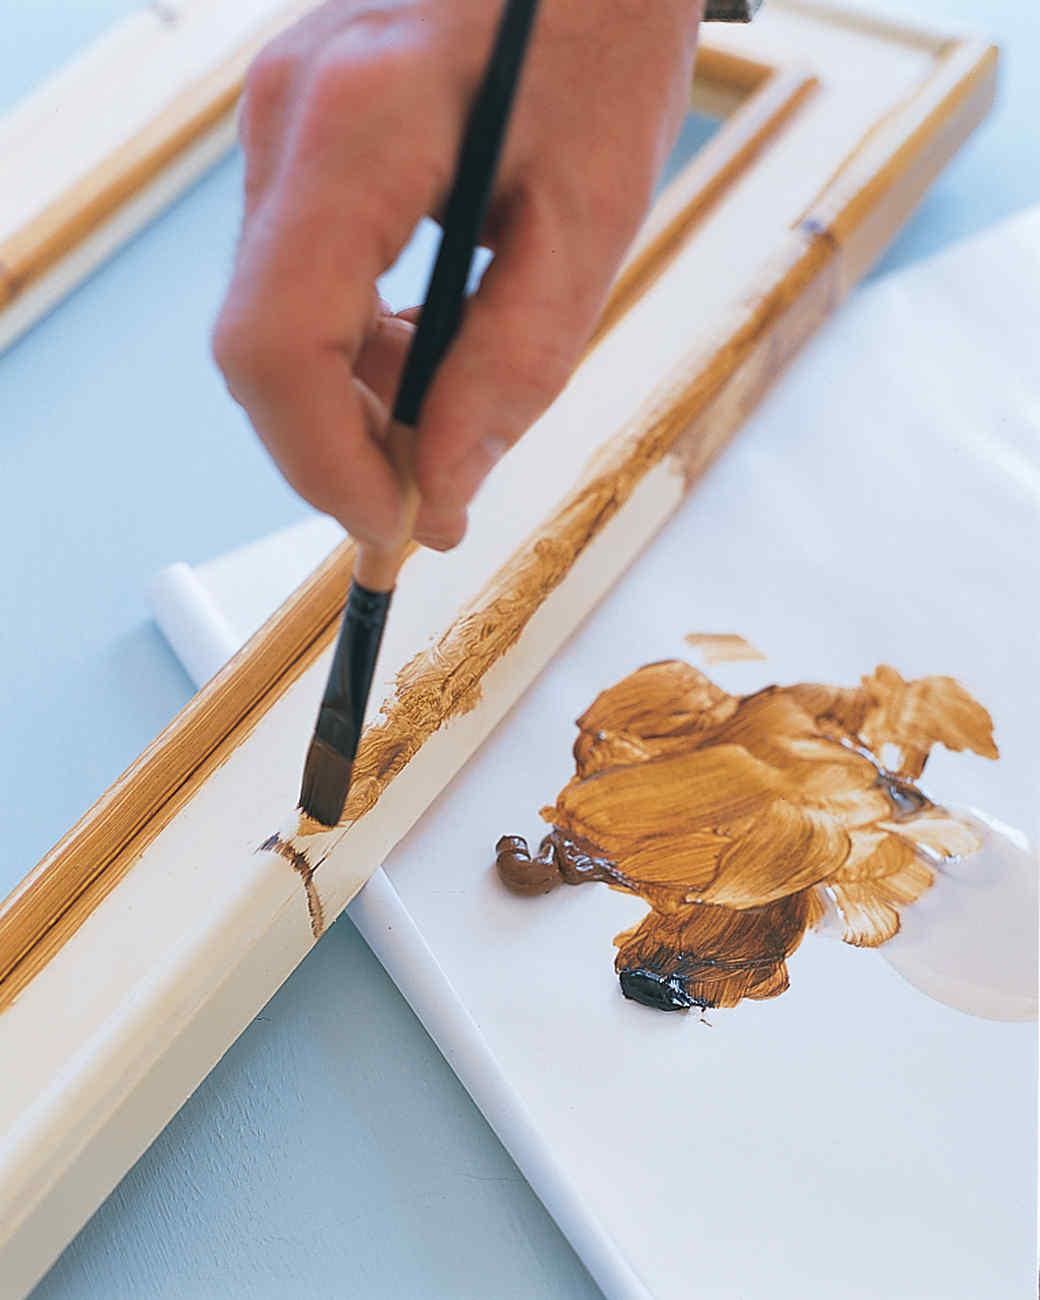 furniture-bamboo-12-d100243-0915.jpg